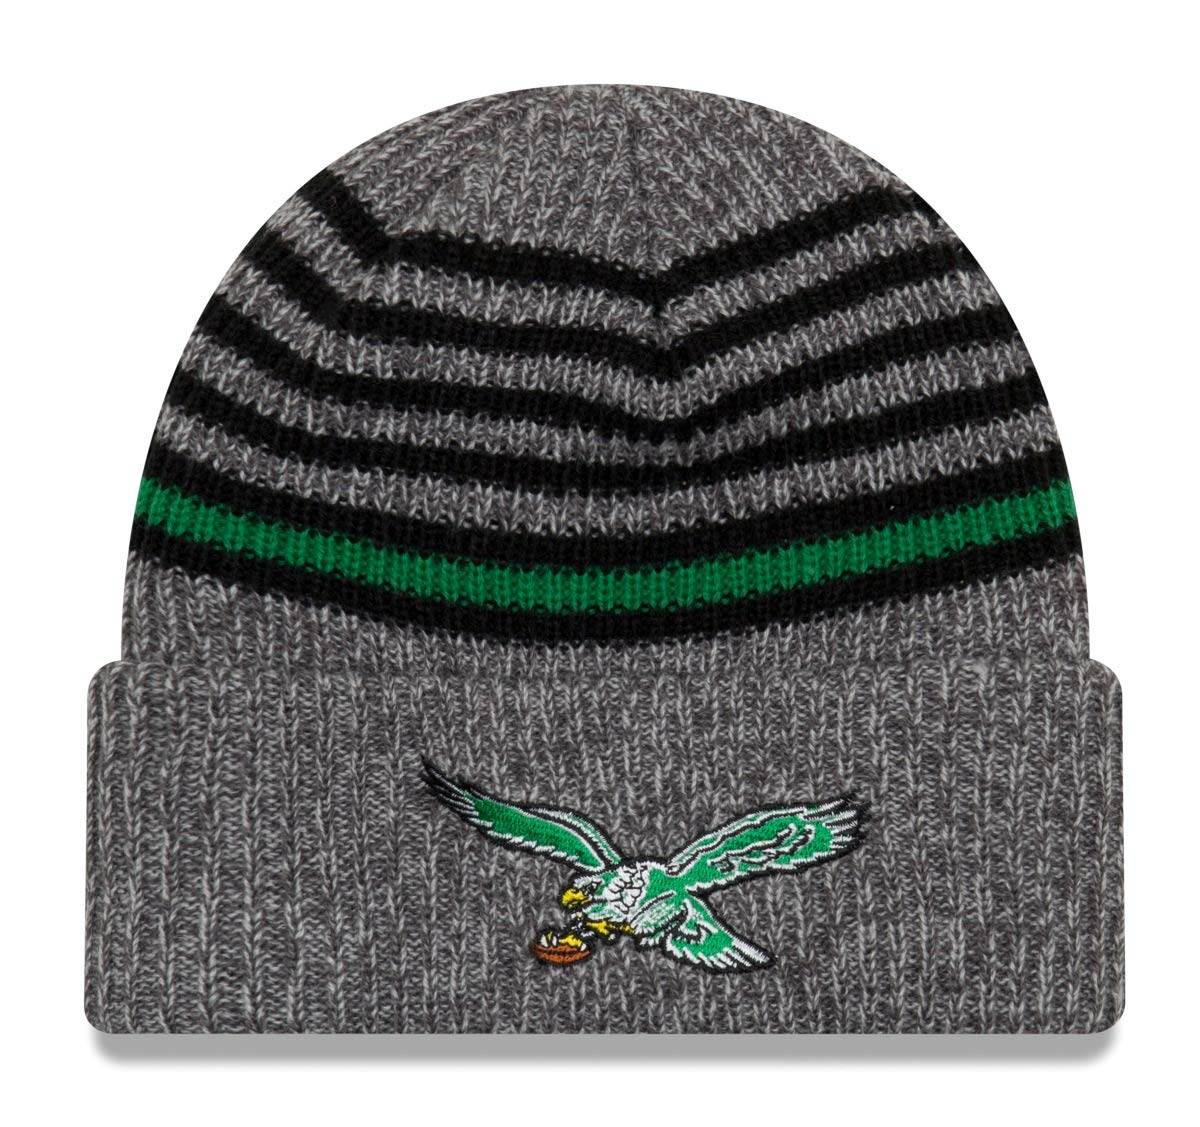 dd1b2eeaa Amazon.com   New Era Philadelphia Eagles Throwback Stripe Strong Cuffed Knit  Hat Cap   Sports   Outdoors